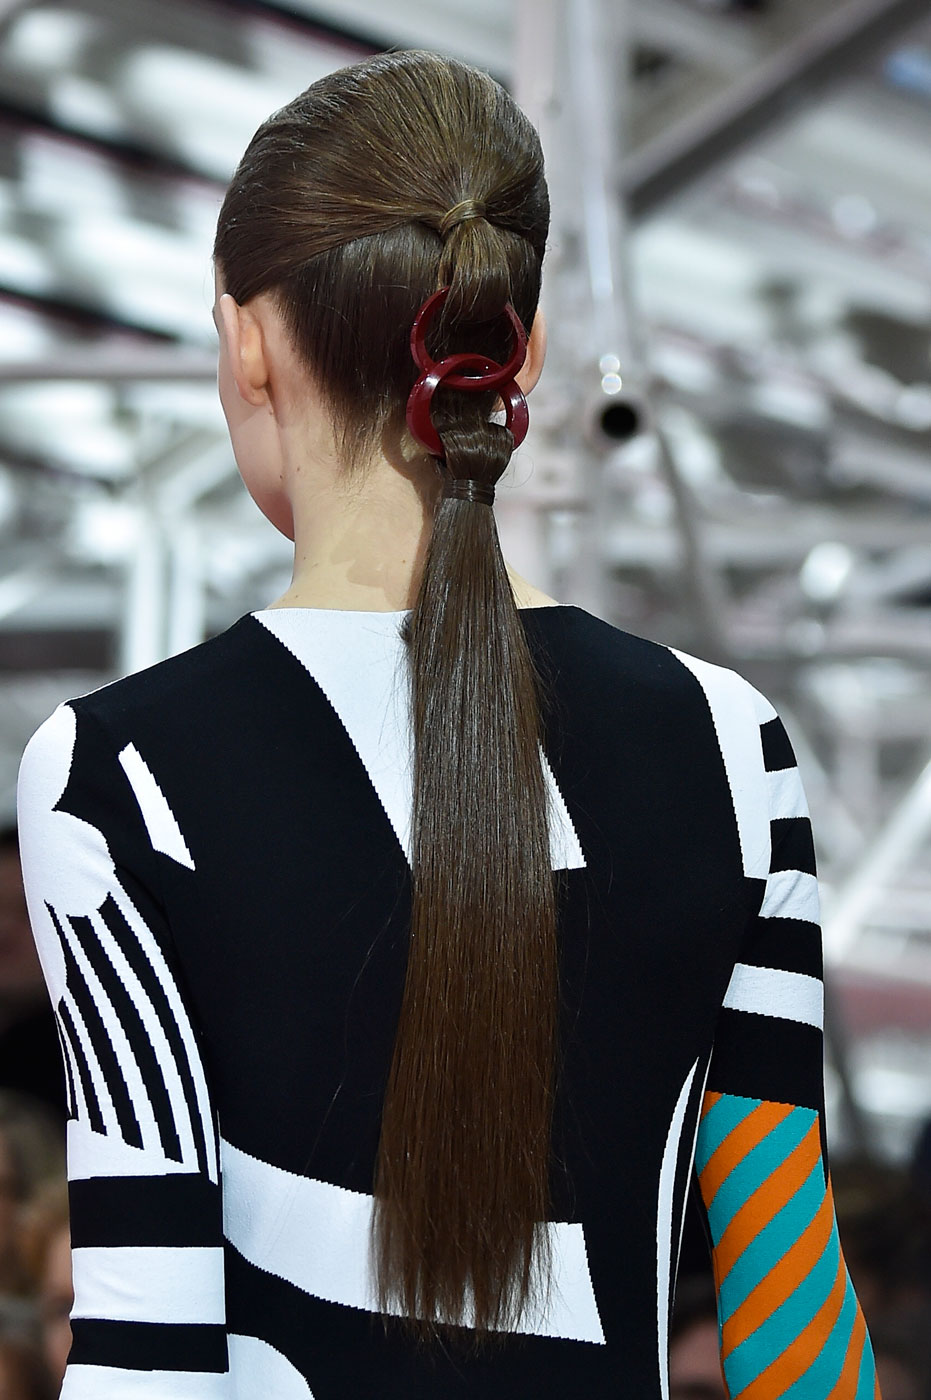 Christian-Dior-fashion-runway-show-close-ups-haute-couture-paris-spring-summer-2015-the-impression-017